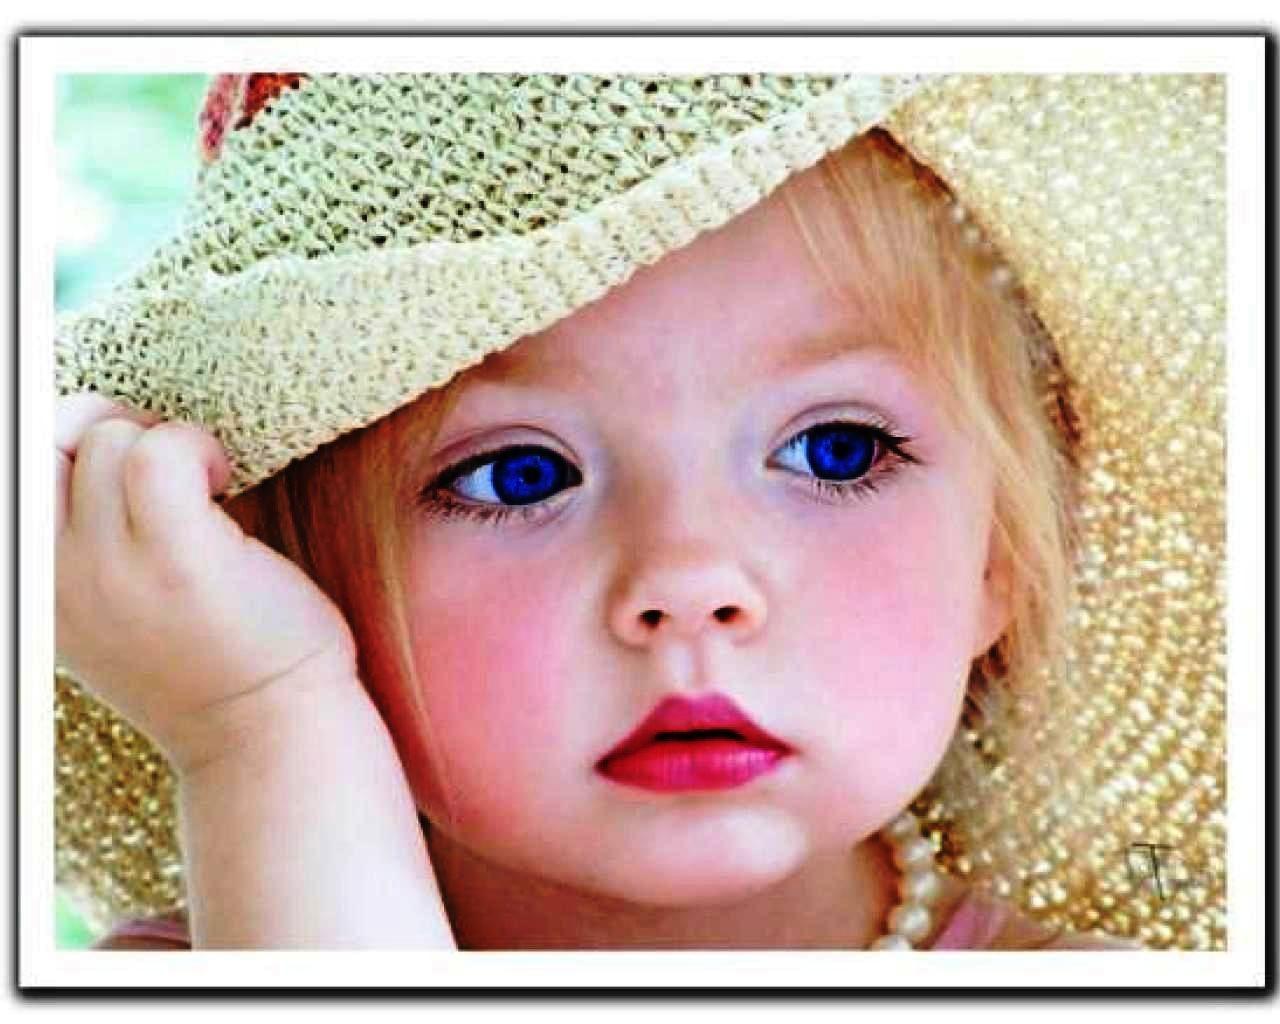 Muslim Child Cute Babies Pinterest Children And Muslim